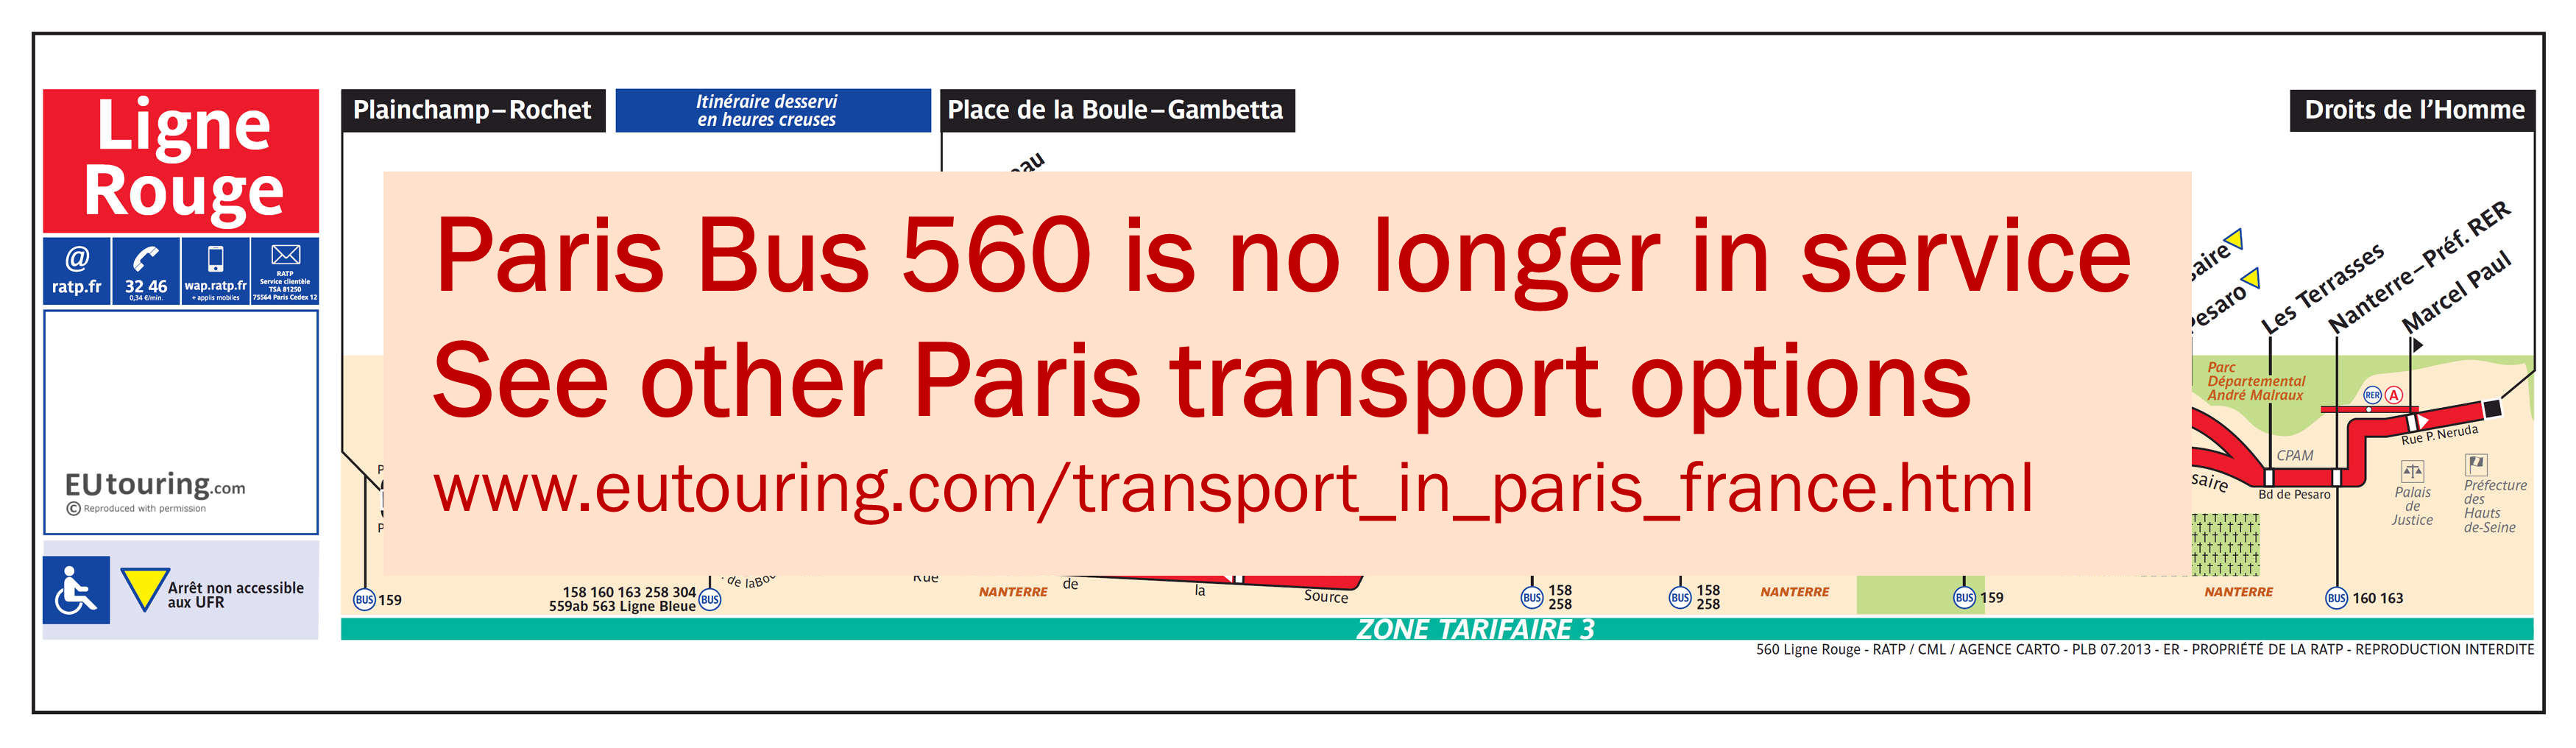 RATP route maps for Paris bus lines 560 through to 569